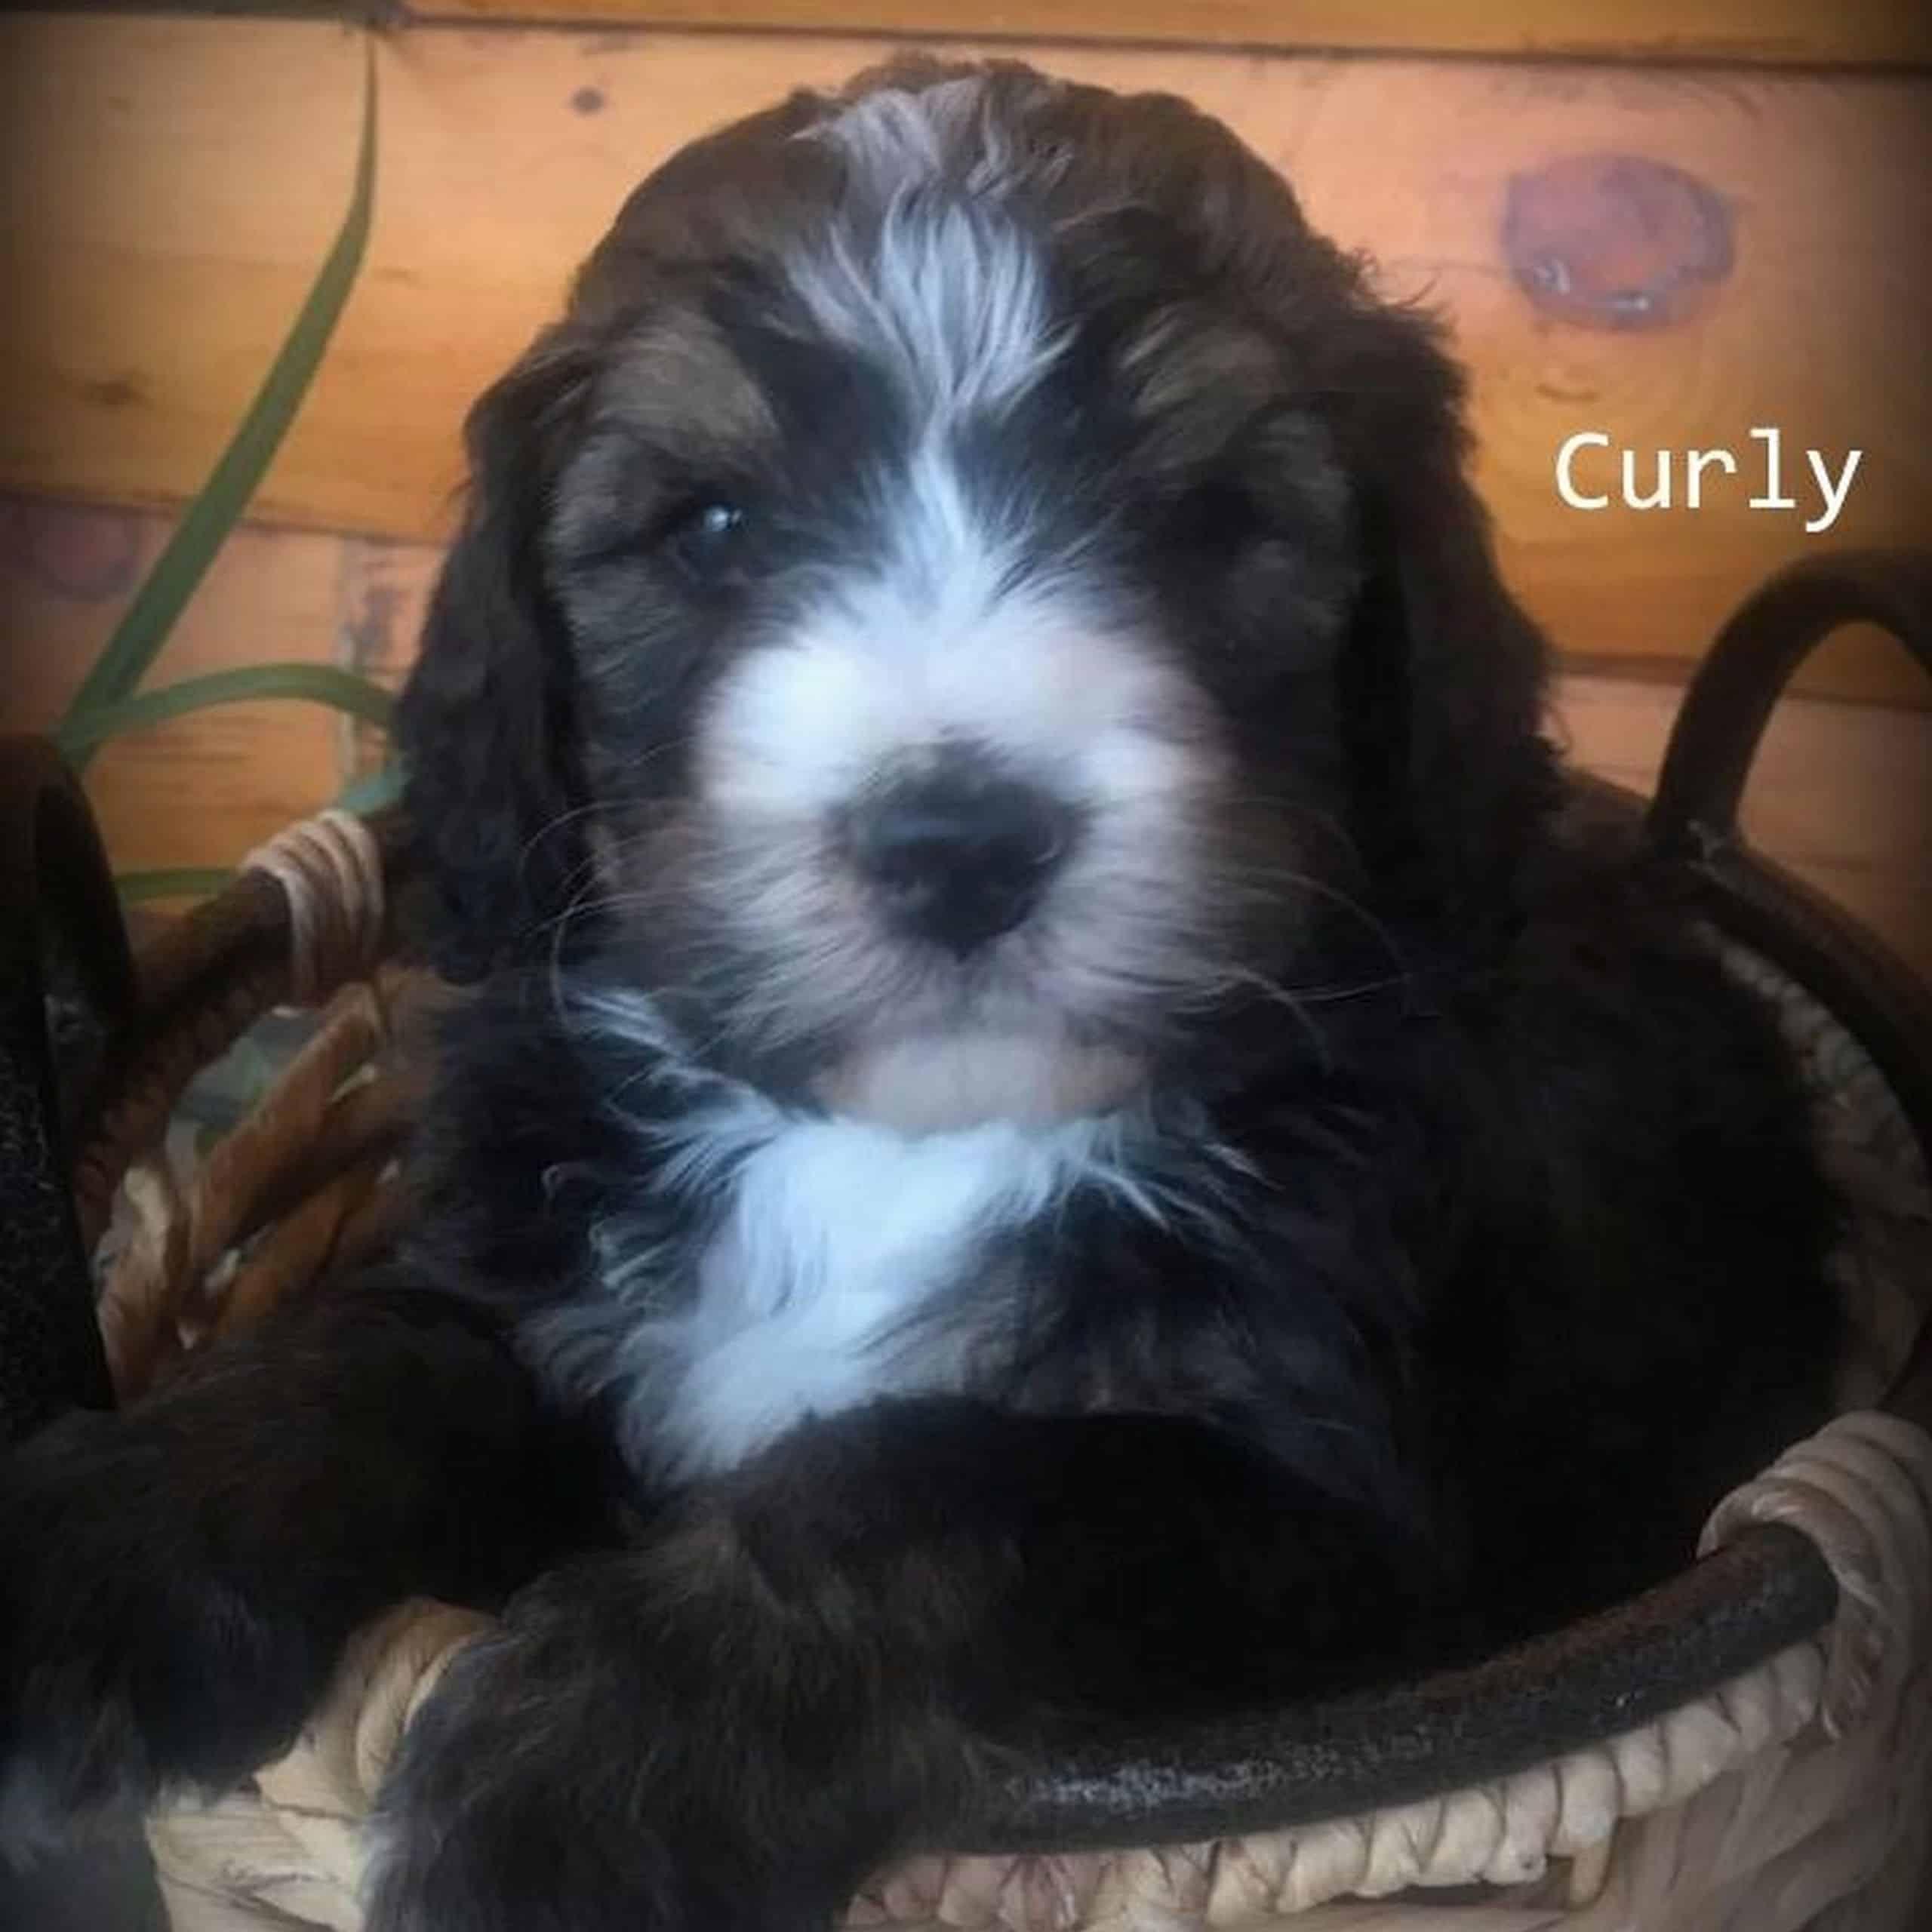 Curly – M